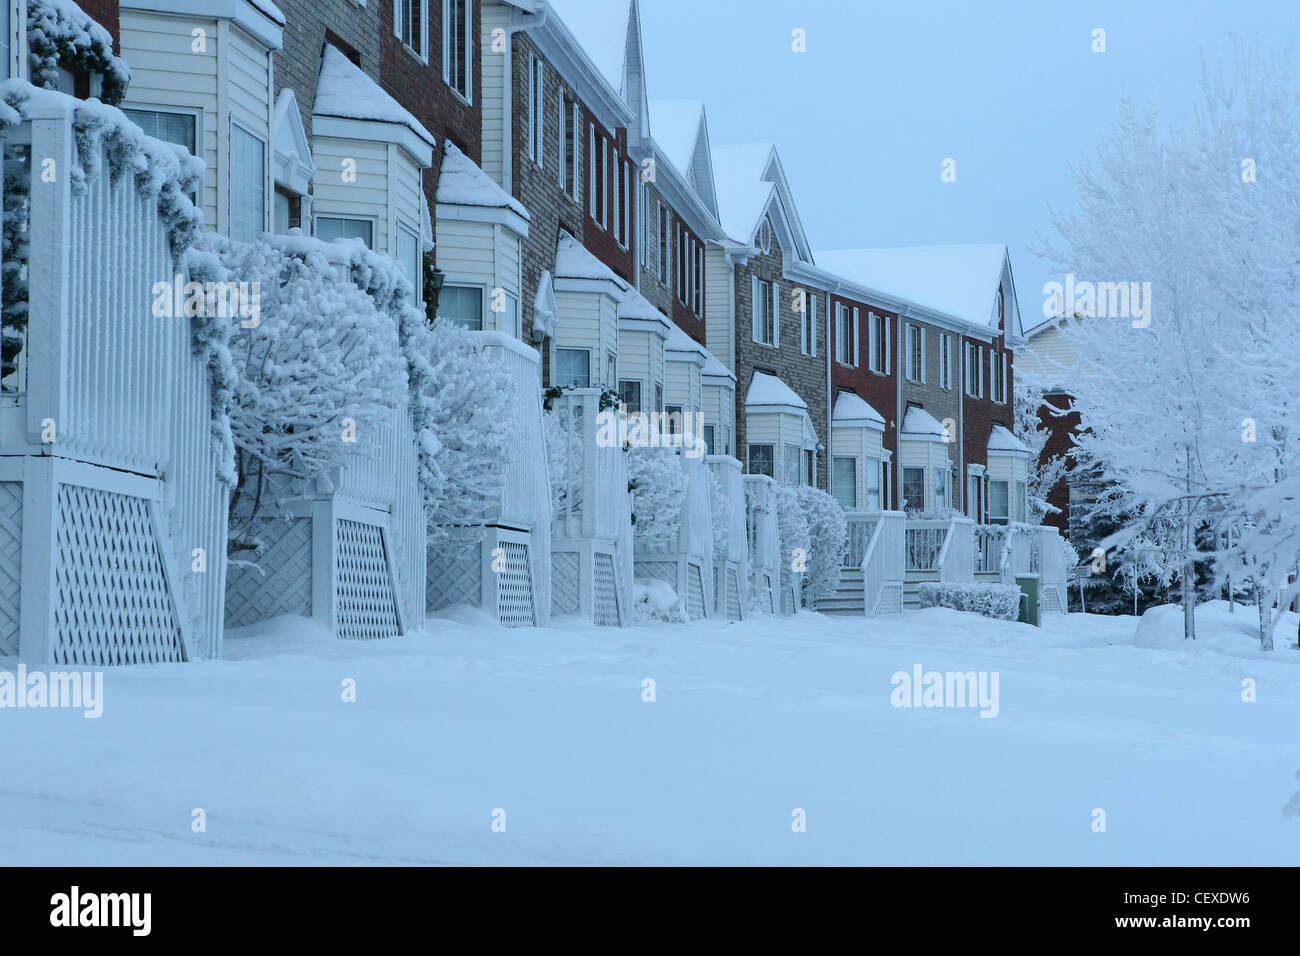 Winter scenes from Calgary, Alberta, Canada  Condominium